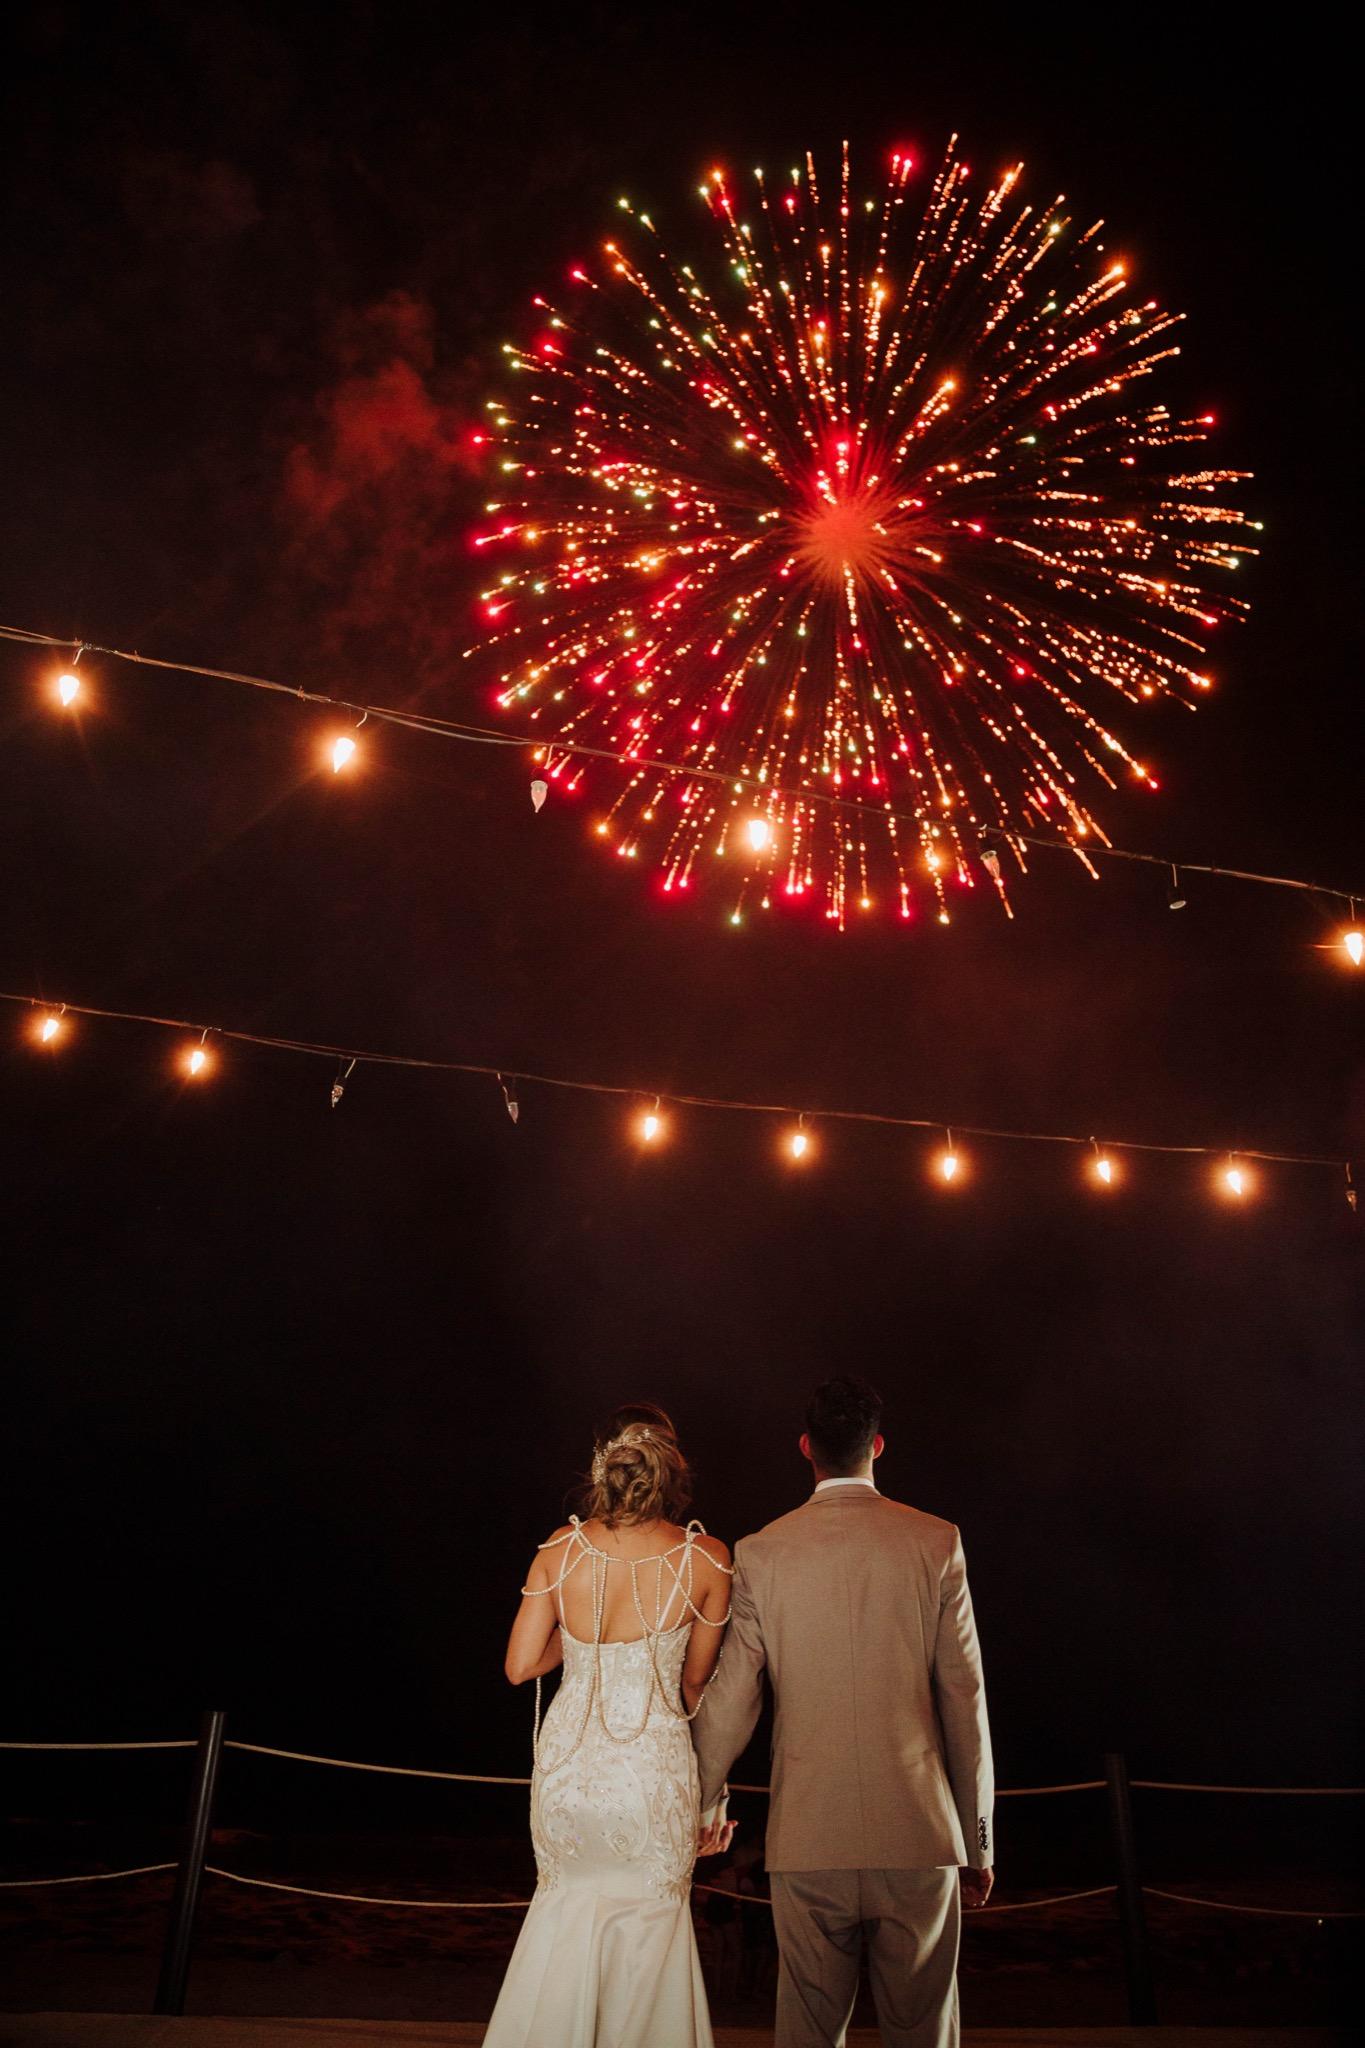 Javier_noriega_fotografo_bodas_profesional_zacatecas_mexico_mazatlan_sinaloa_photographer_weddings75